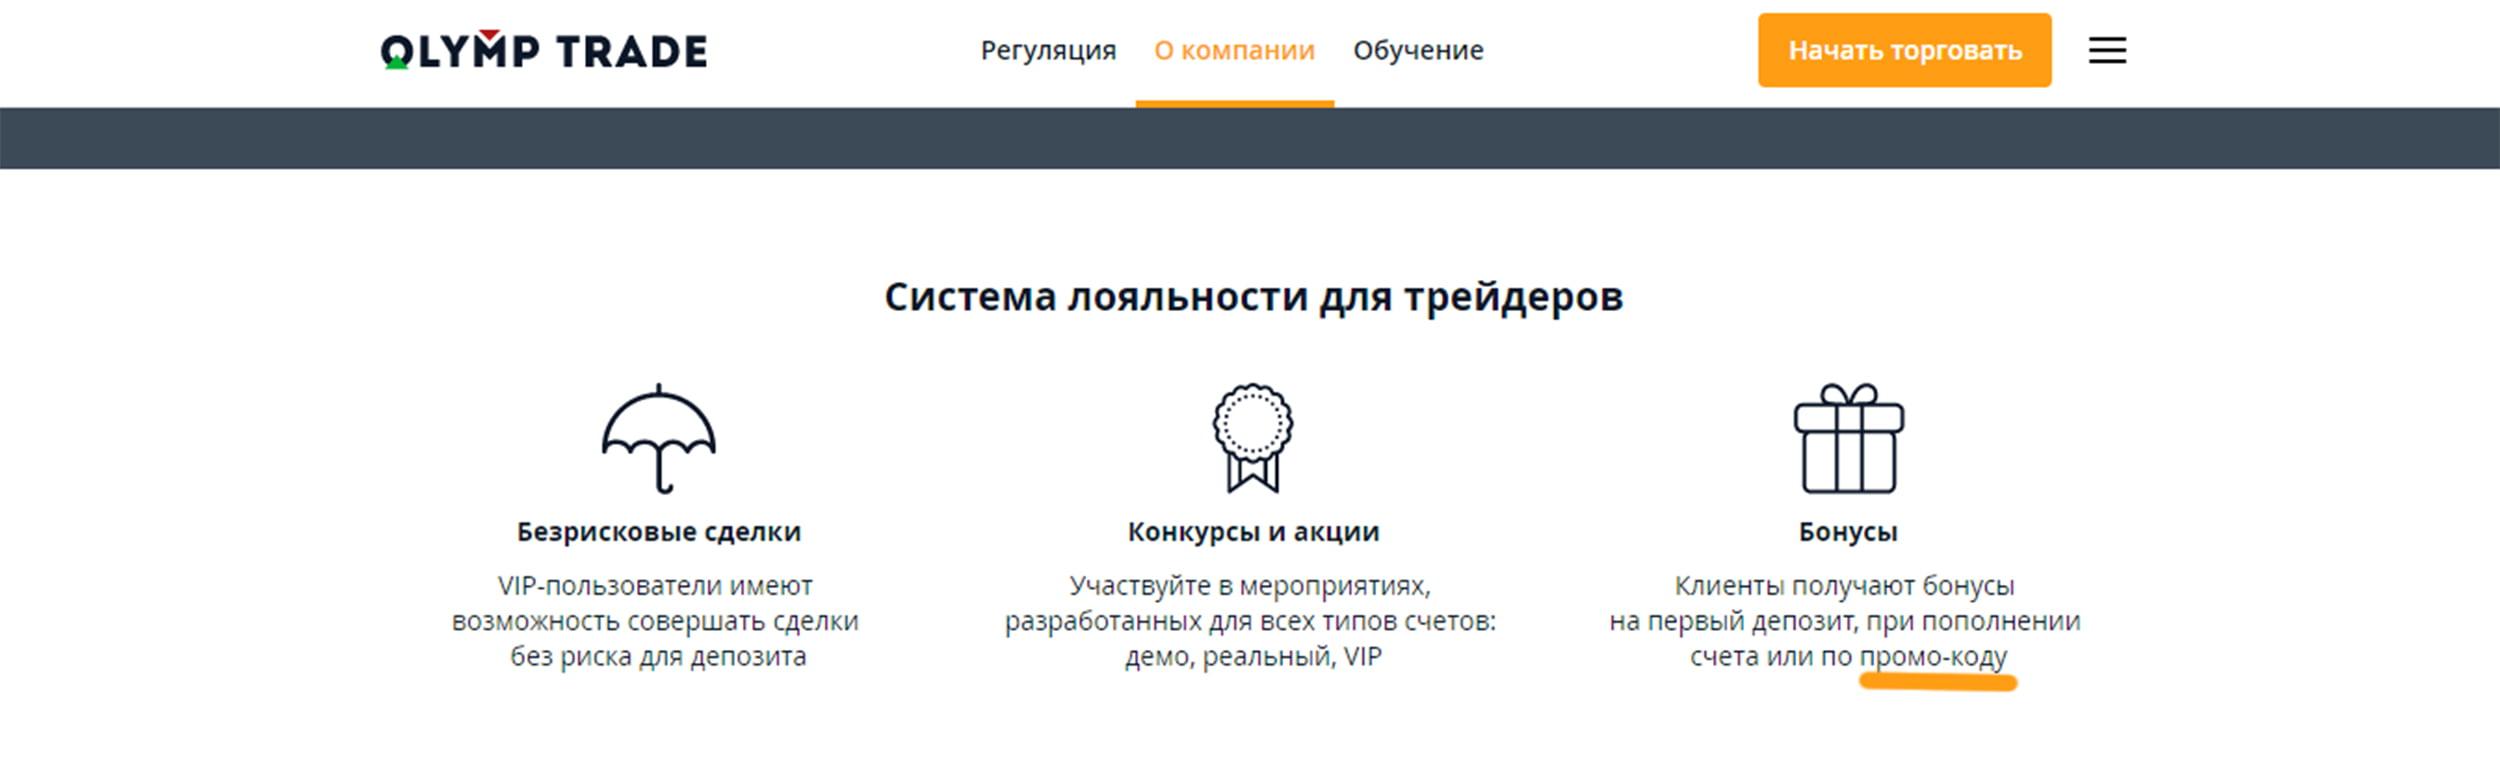 Кран биткоин автоматический 2017-11